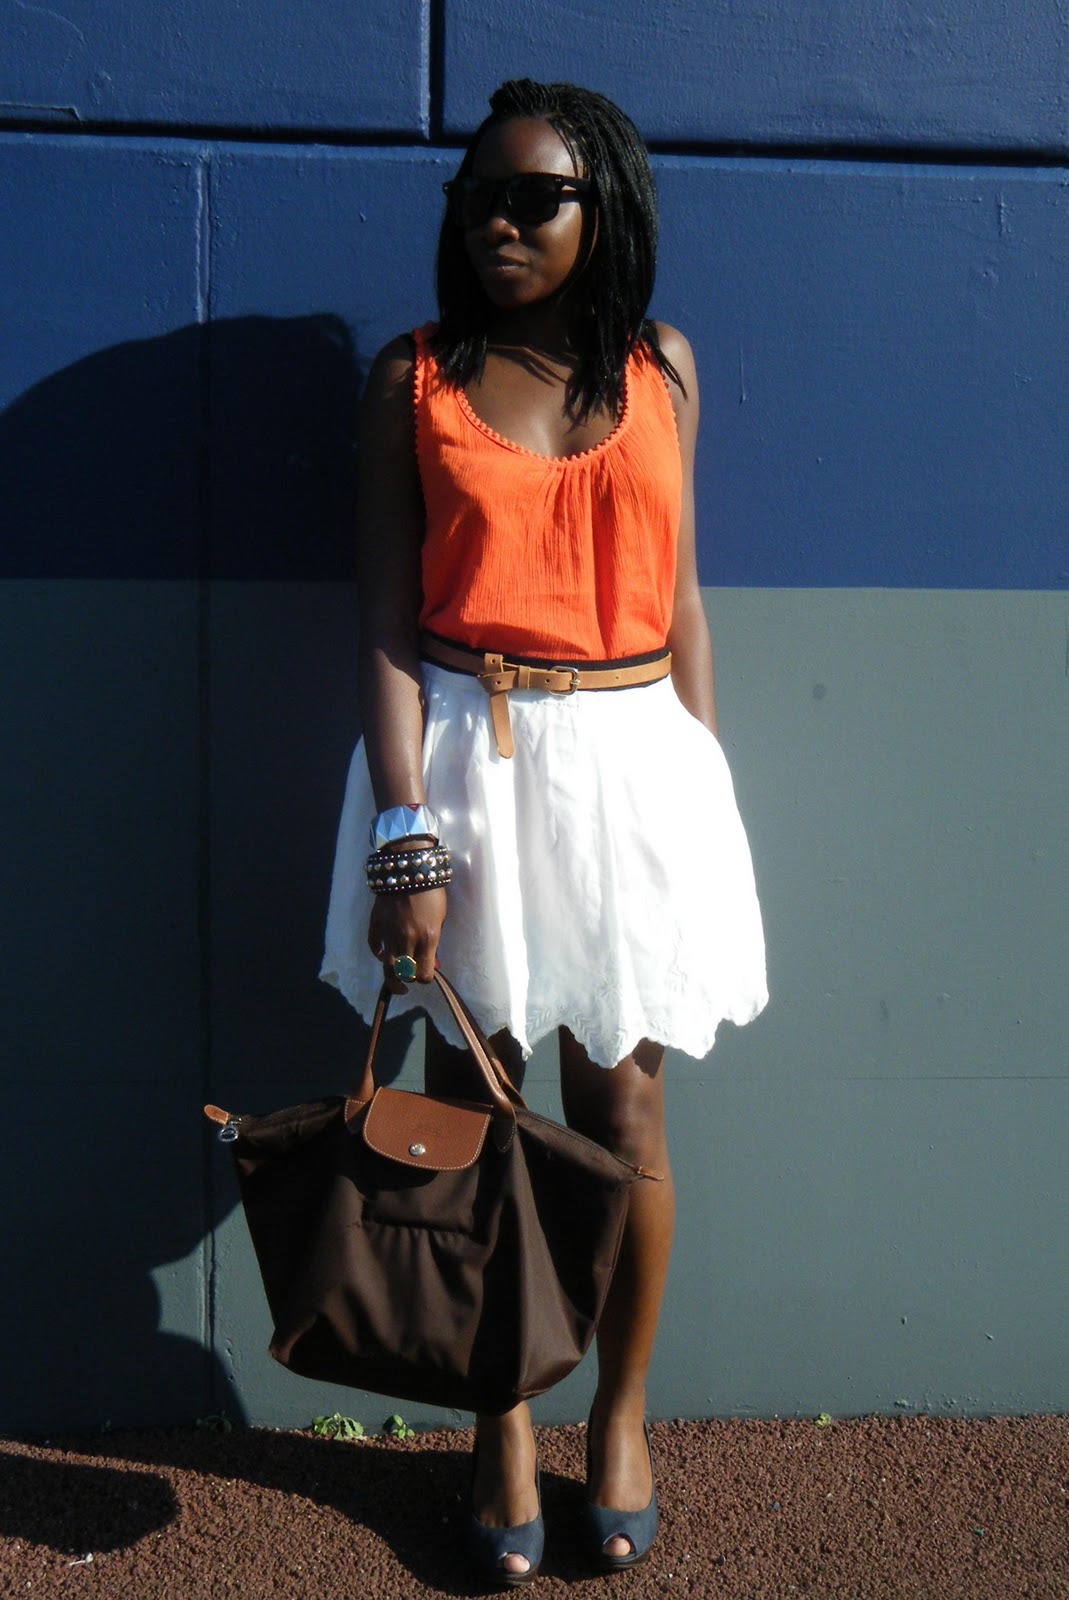 http://2.bp.blogspot.com/-FZo0aaM4XIU/TqoAB-DbXwI/AAAAAAAASfU/E7EdKGwecj8/s1600/orange%2526white.jpg